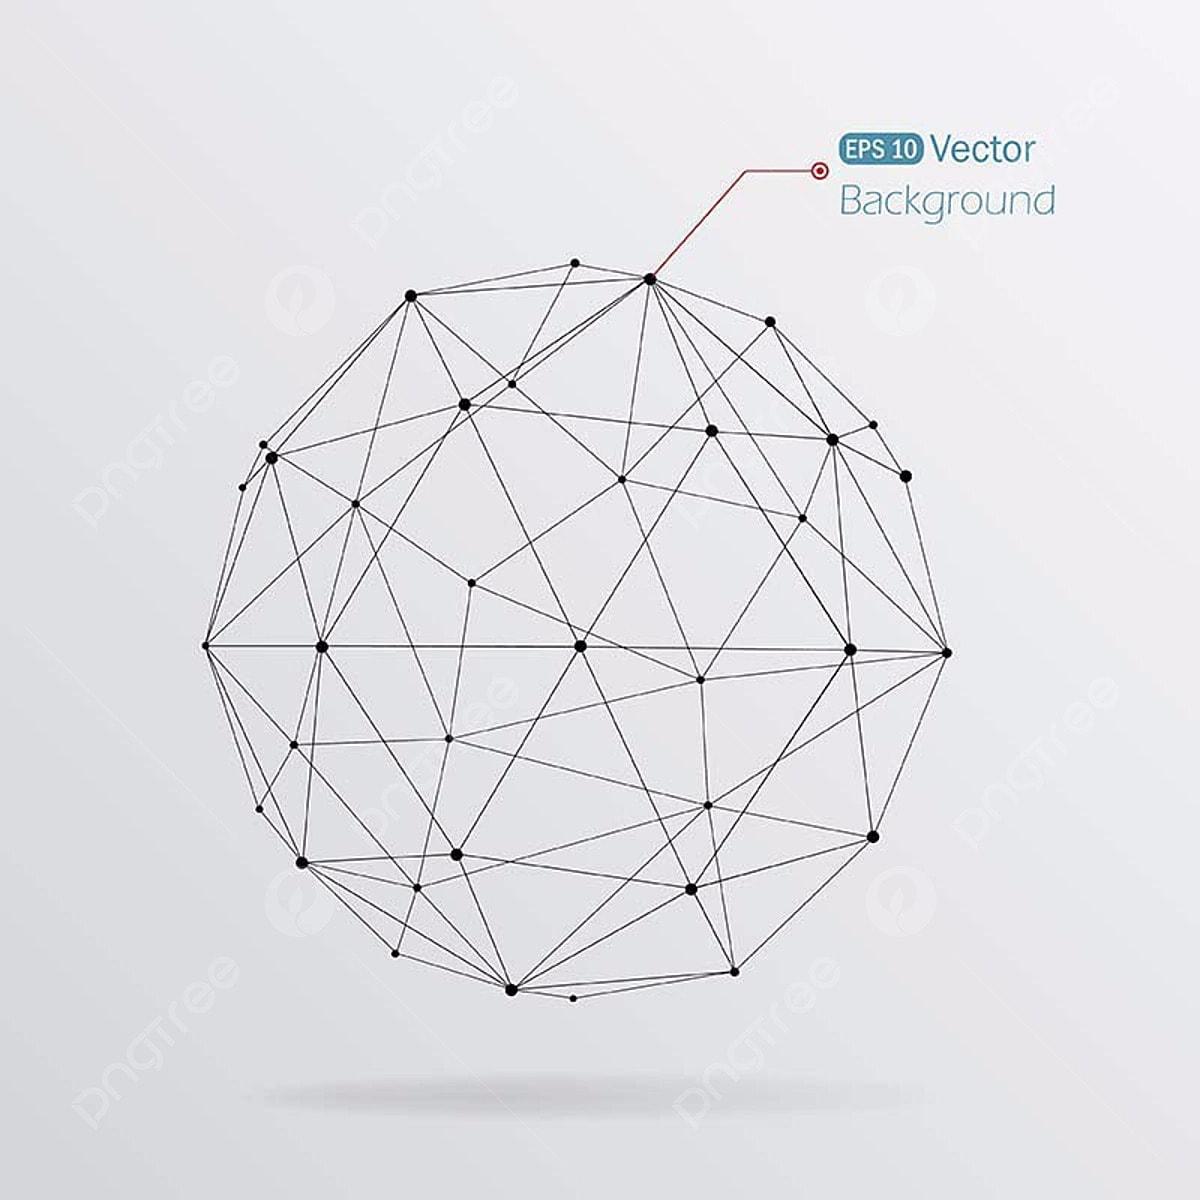 Abstrakte Geometrische Linie Kunst Design Abstract 3d Png